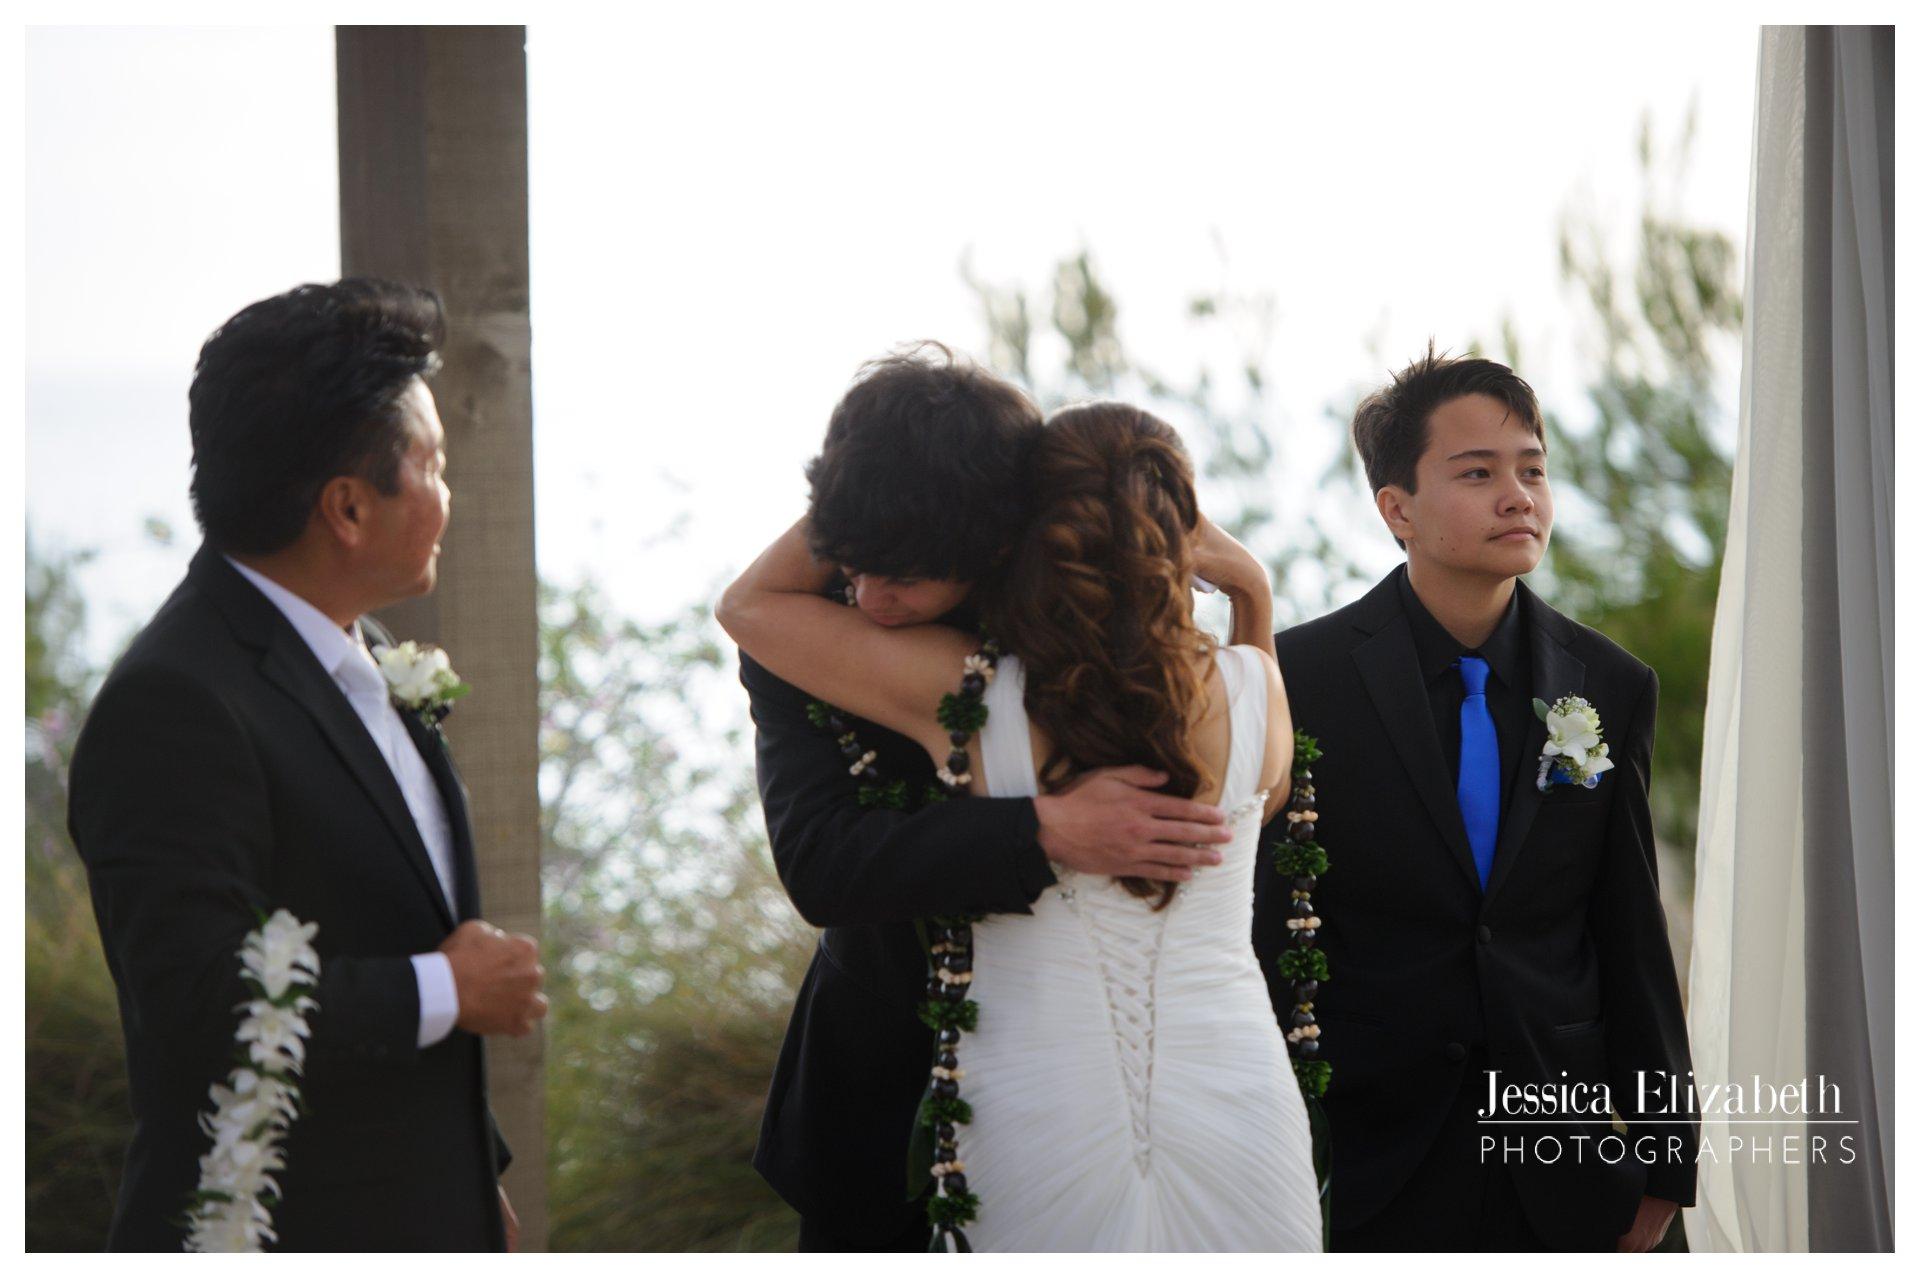 23-Terranea-Palos-Verdes-Wedding-Photography-by-Jessica-Elizabeth-w.jpg